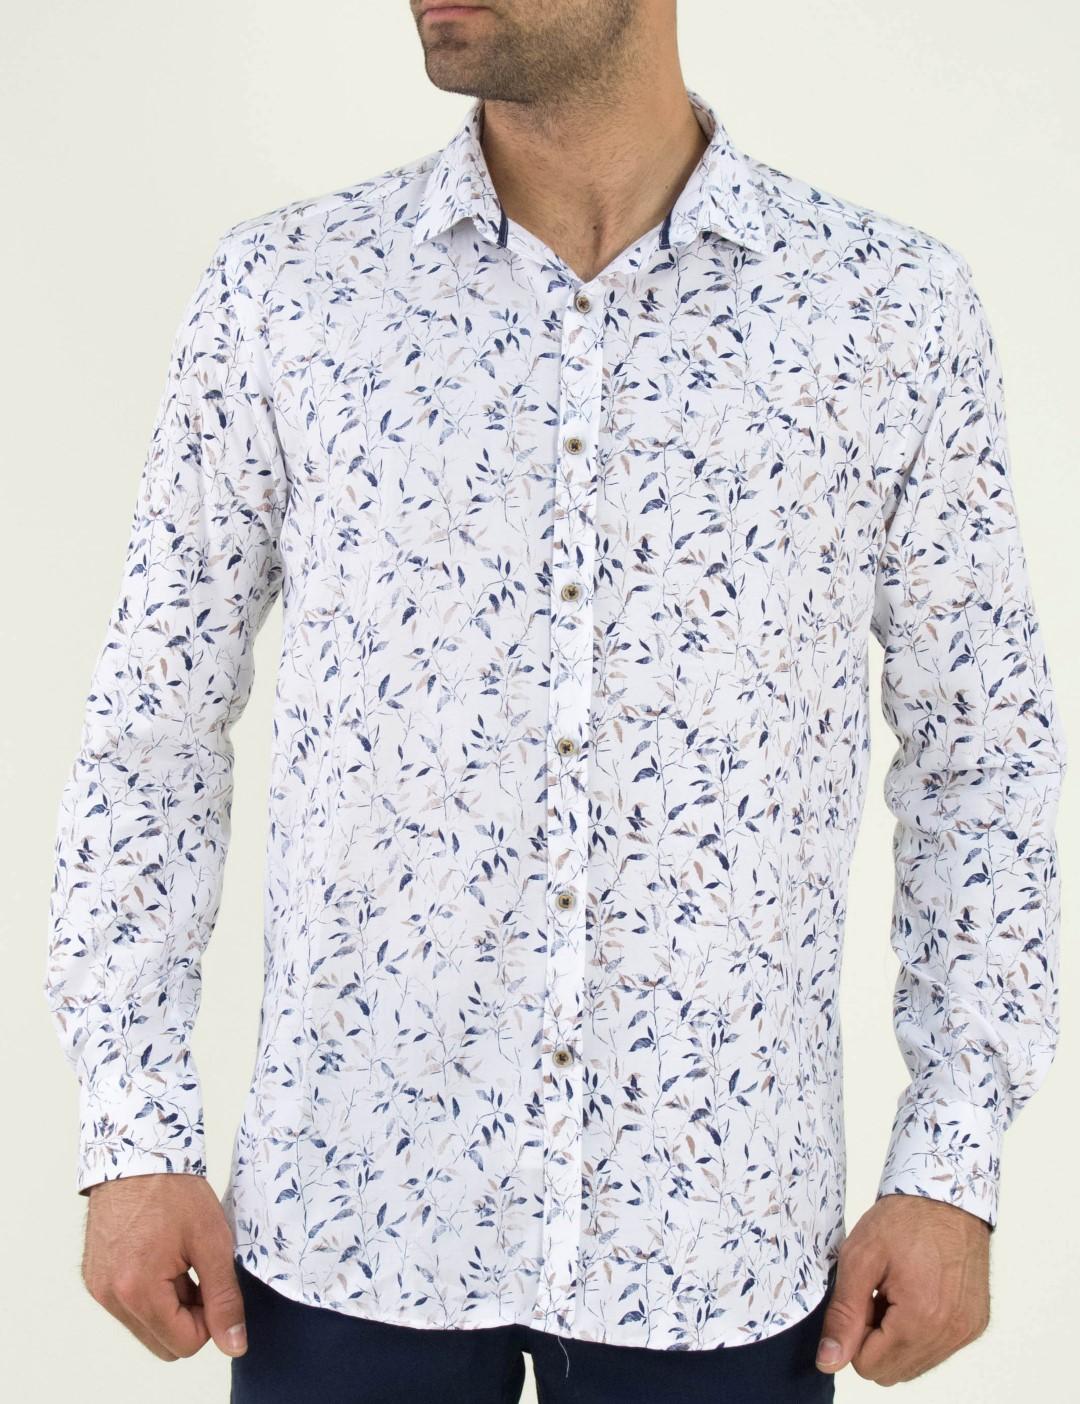 ae420e1ef71f Ανδρικό λευκό πουκάμισο φλοραλ Firenze 01951089